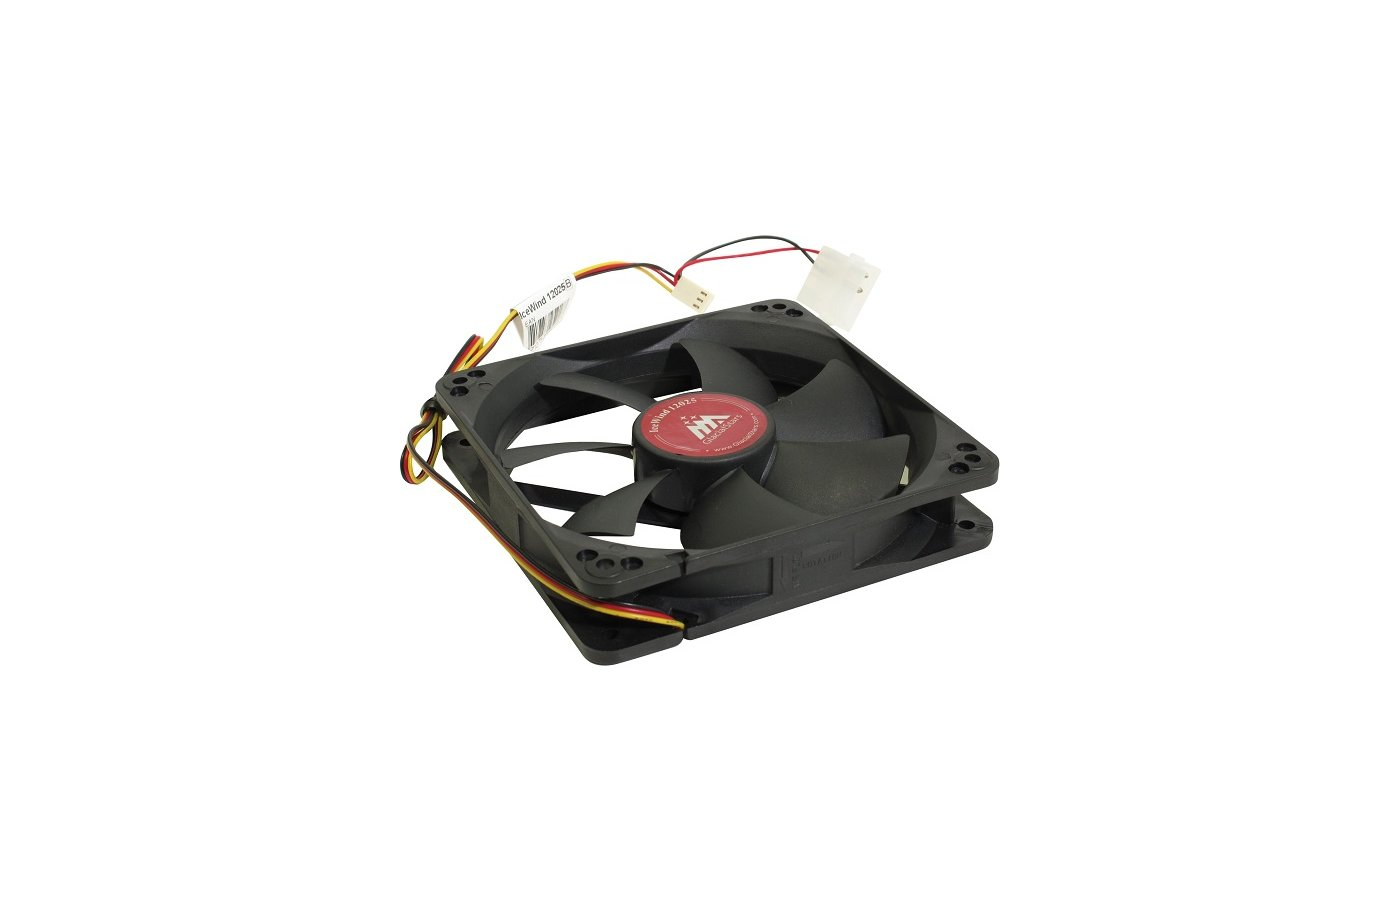 Охлаждение Glacialtech IceWind 12025 120x120x25 3pin+4pin (molex) 20dB 110g BULK для корпуса